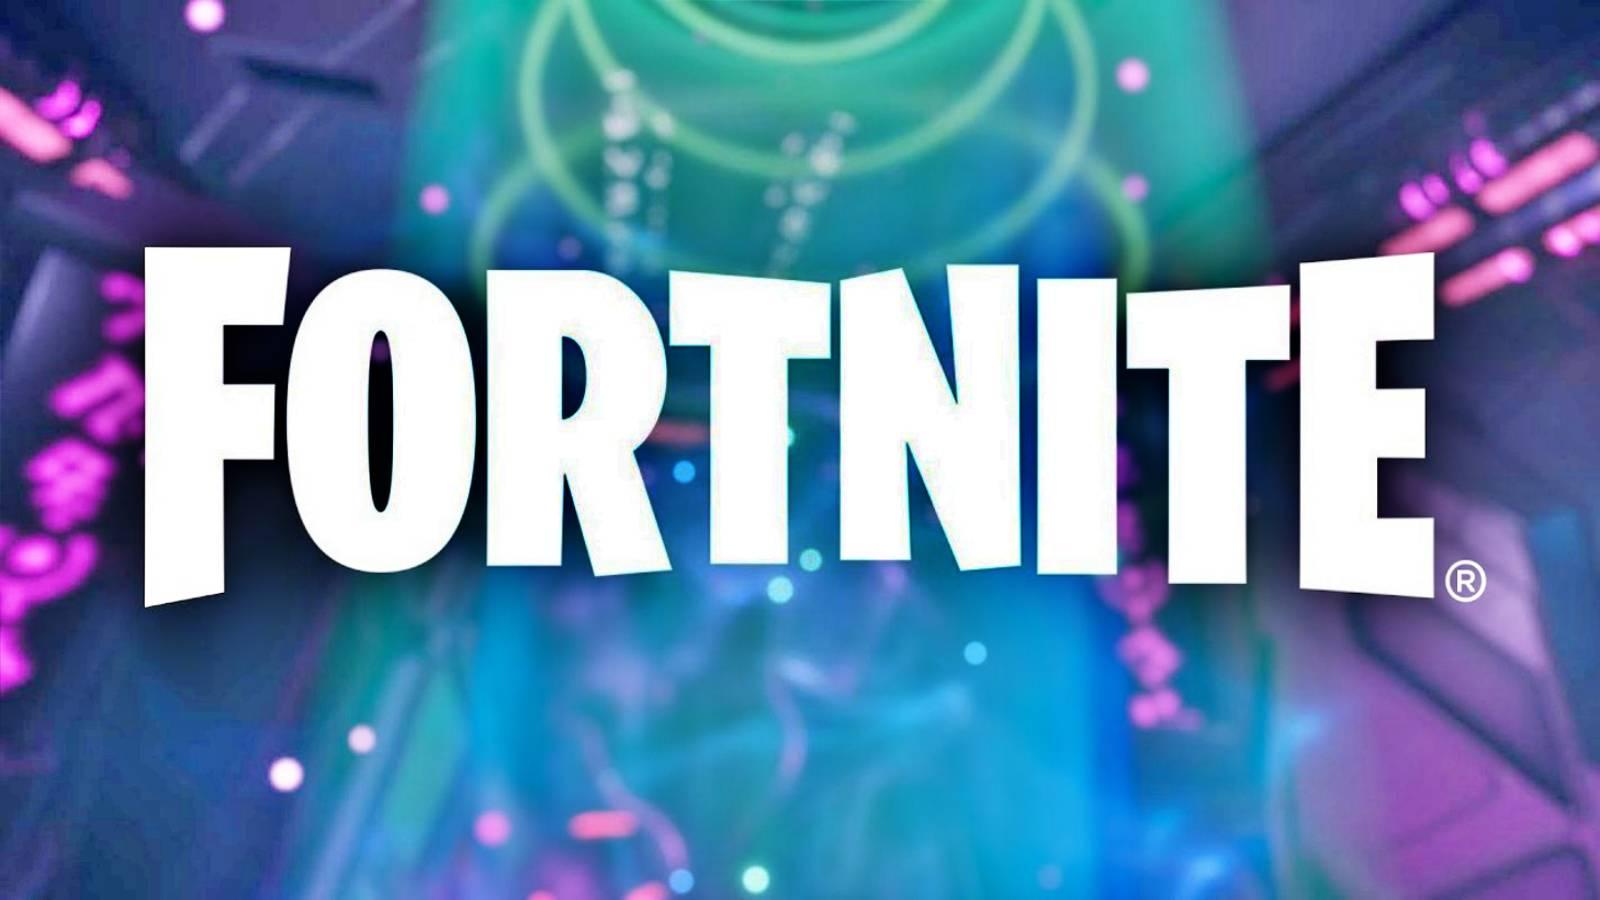 Fortnite Schimbari Actualizarea 17.10 Jucatorilor